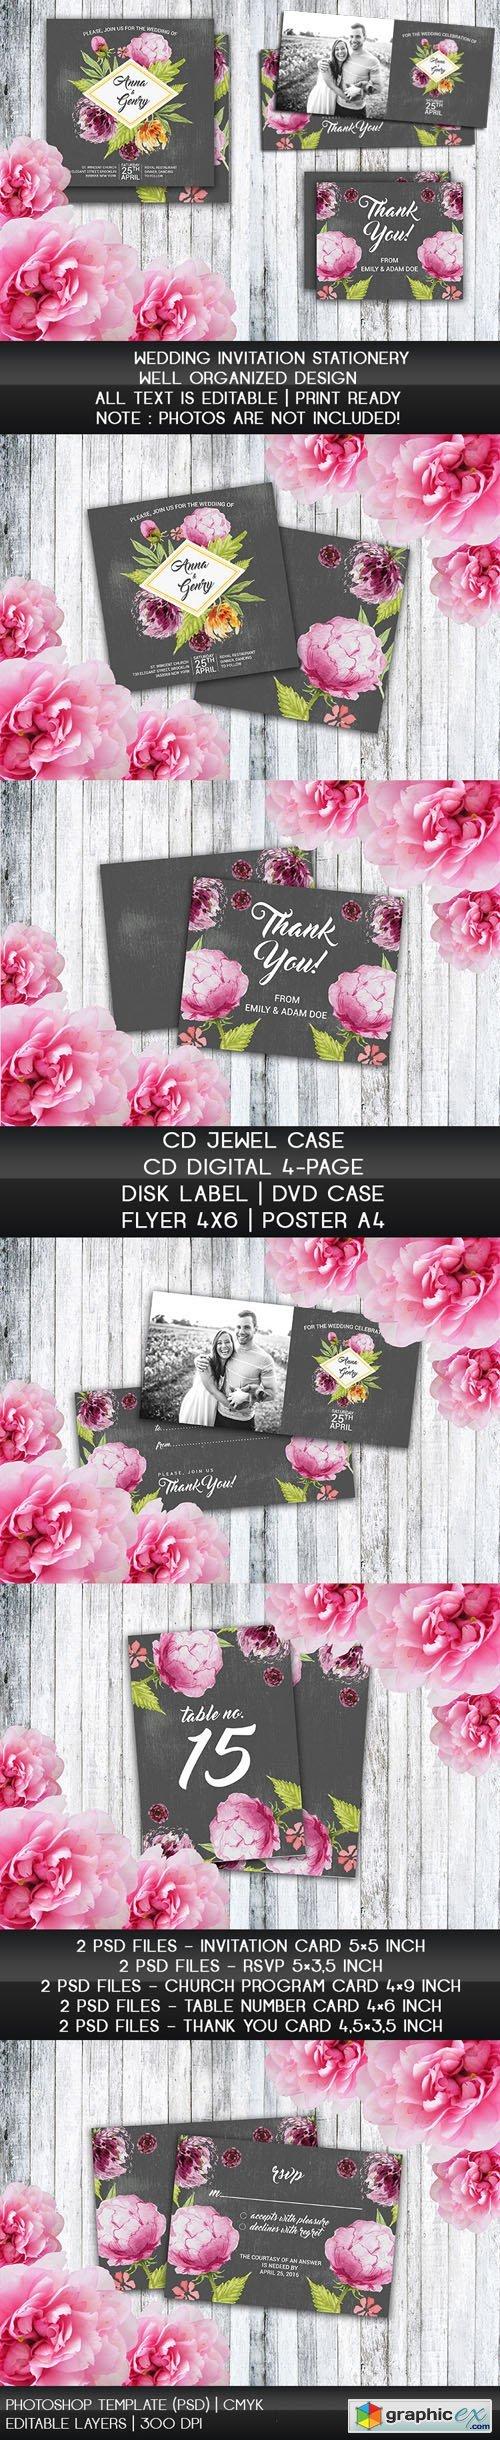 Wedding Invitation Stationery Psd Templates Free Download